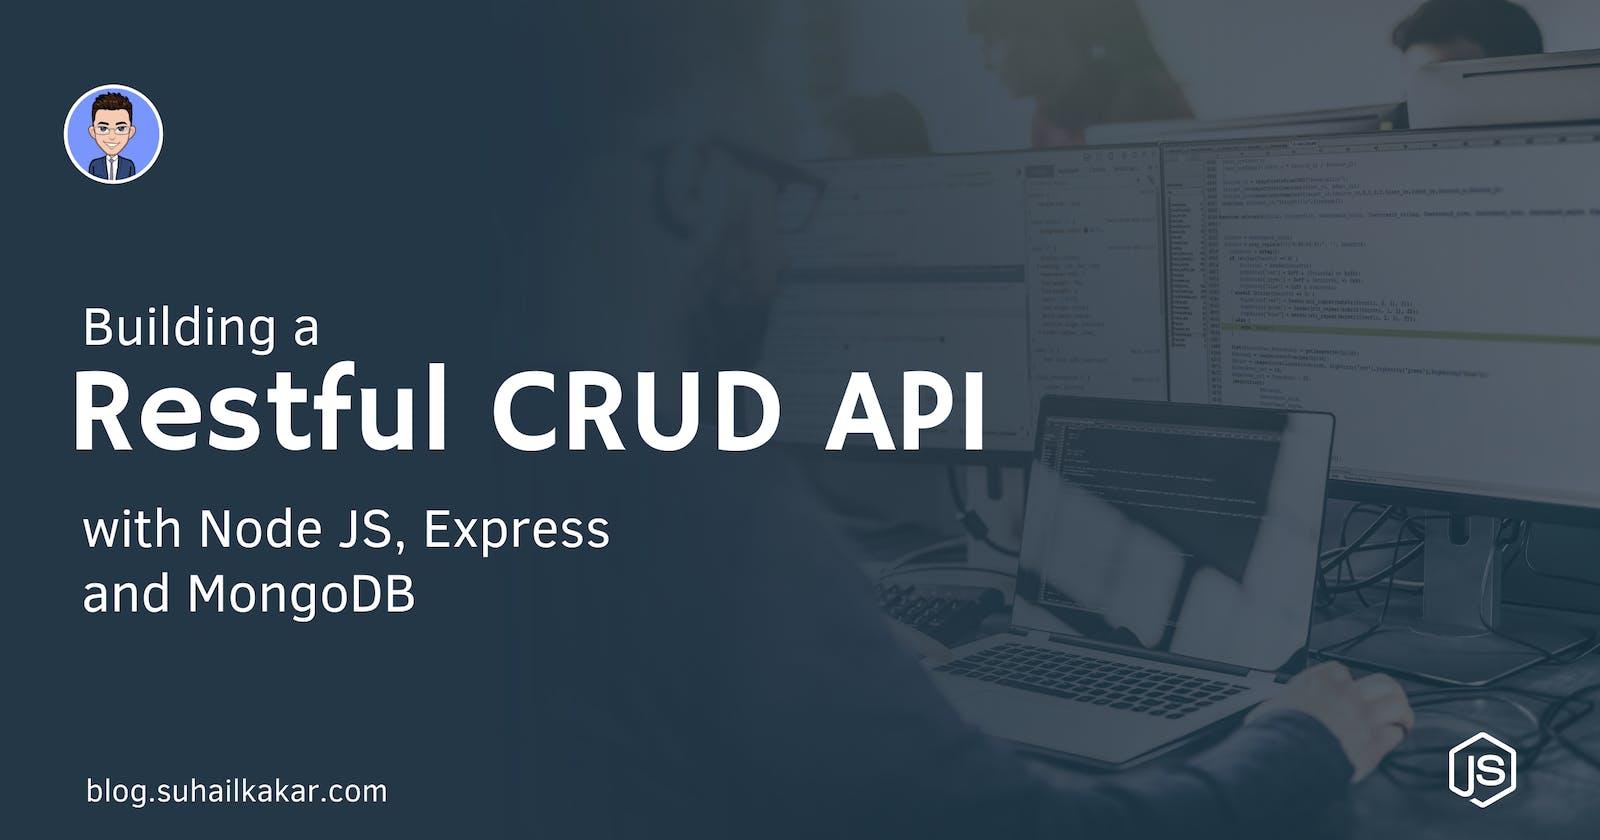 Building a Restful CRUD API with Node JS, Express, and MongoDB